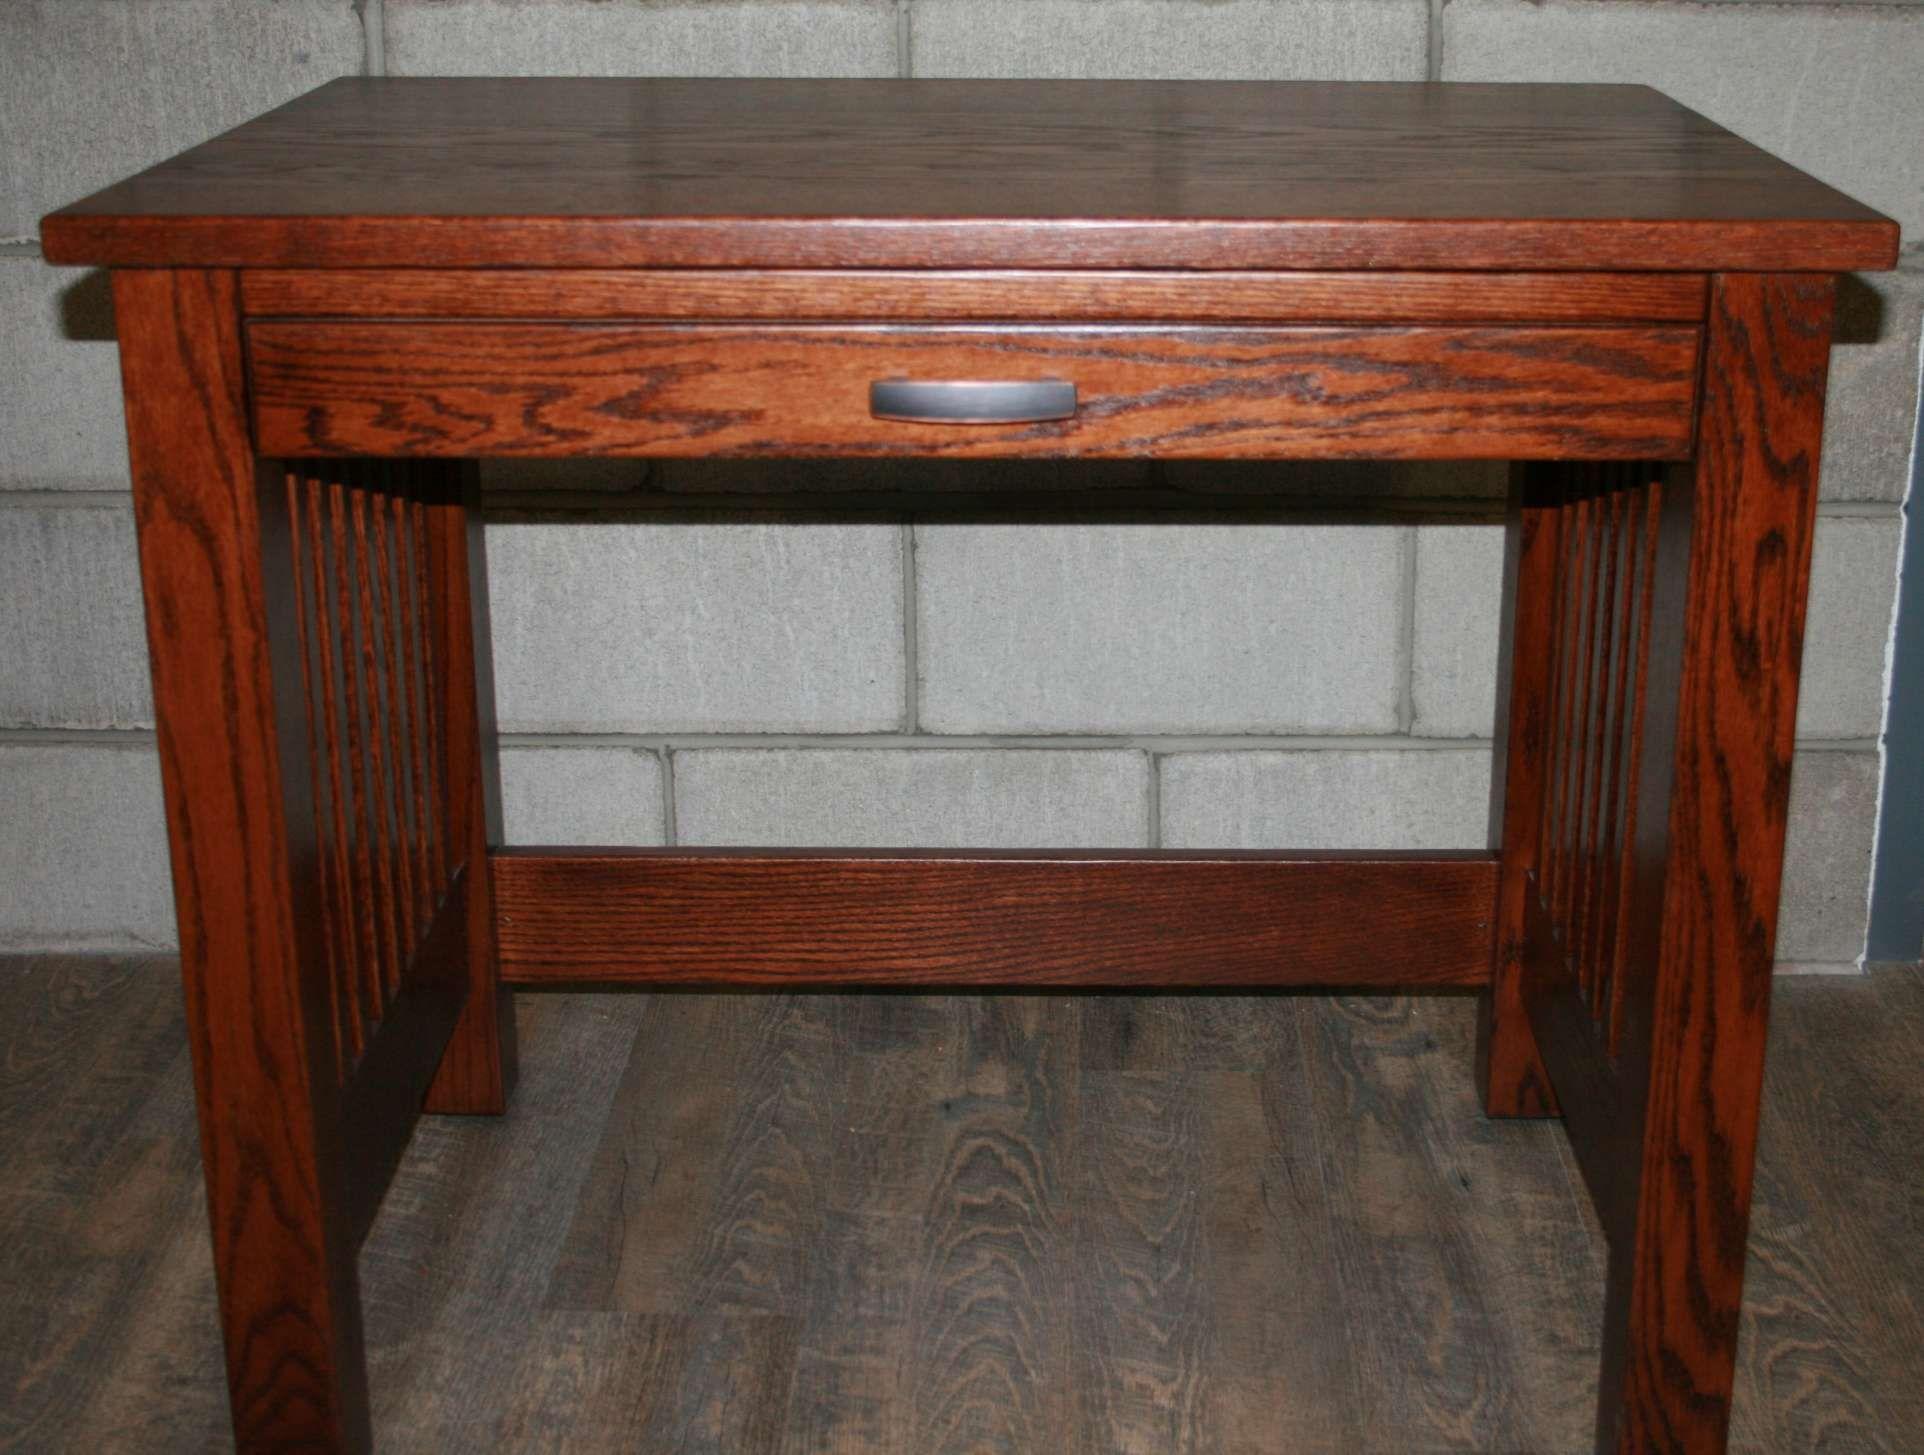 12 Splendid Small Solid Wood Desk Gallery Wooden Furniture